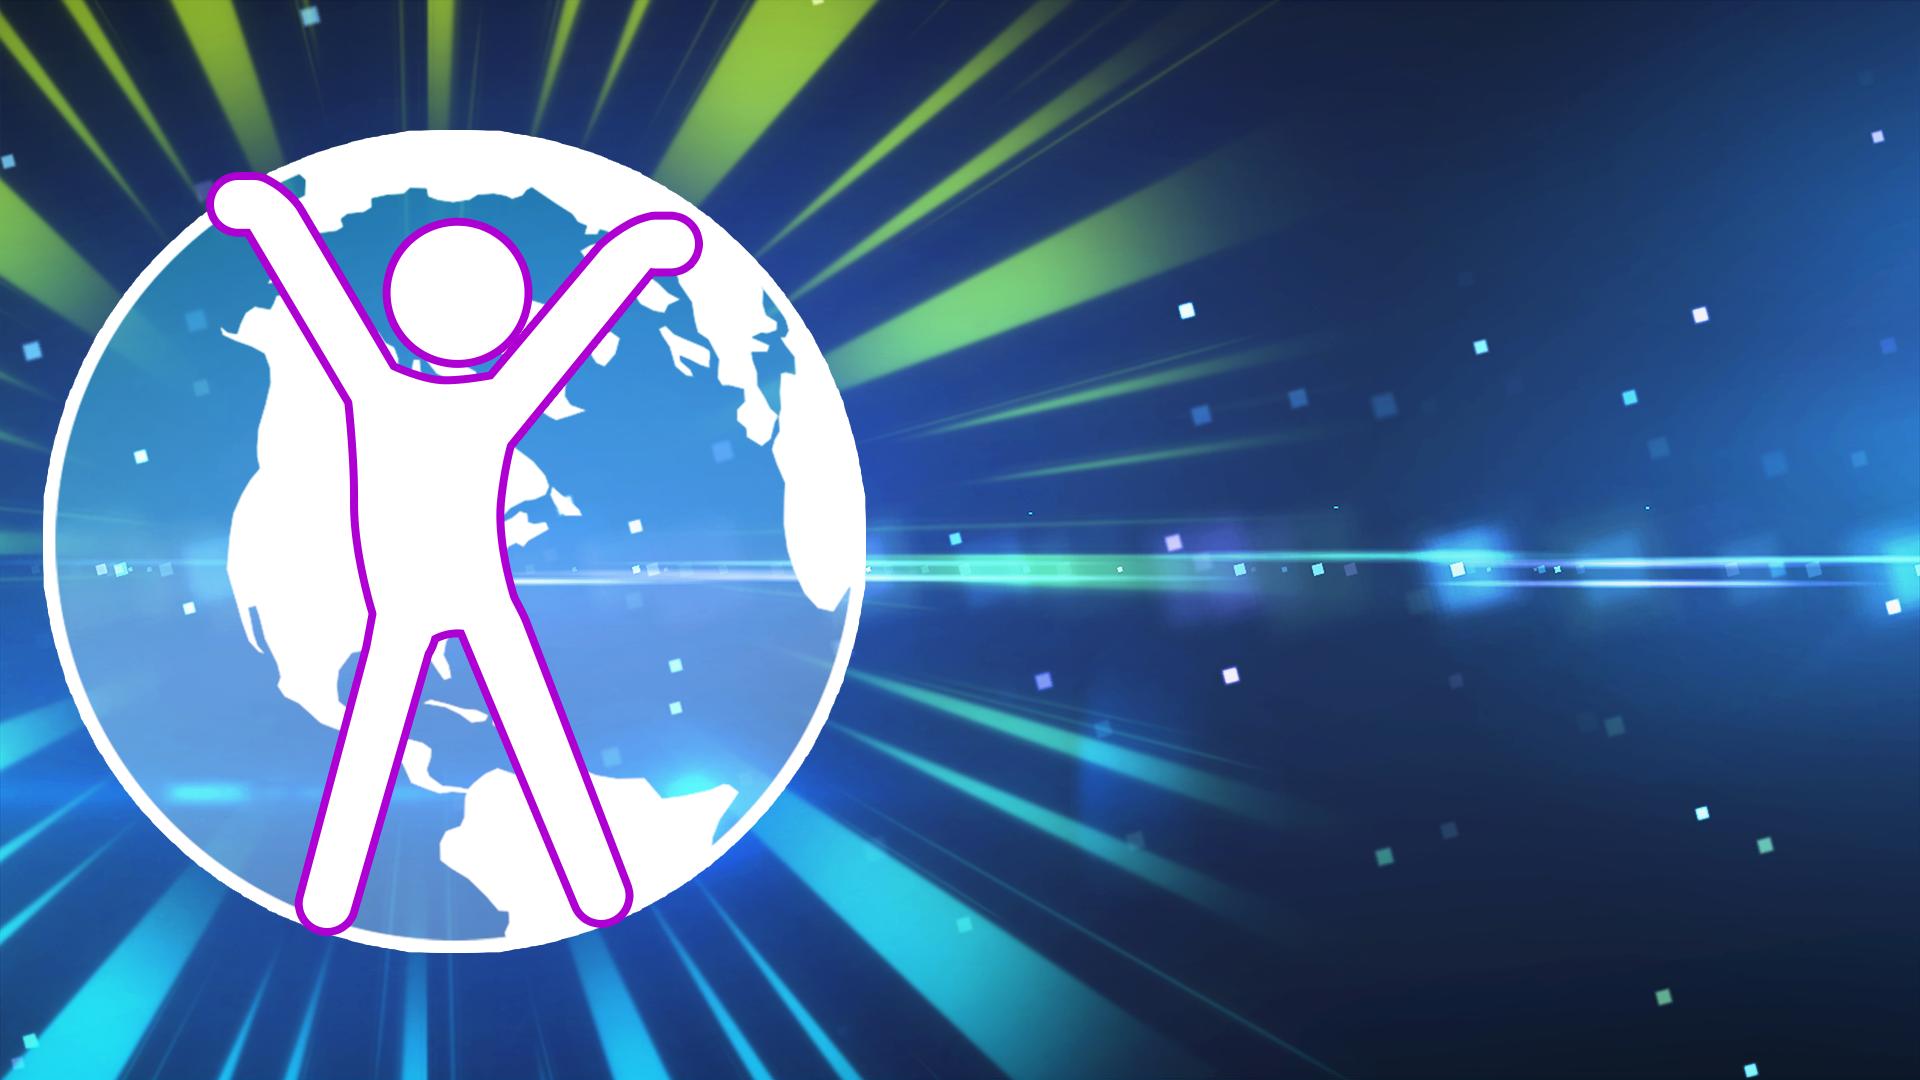 Competitive spirit achievement in just dance 2015 for 1 2 3 4 dance floor